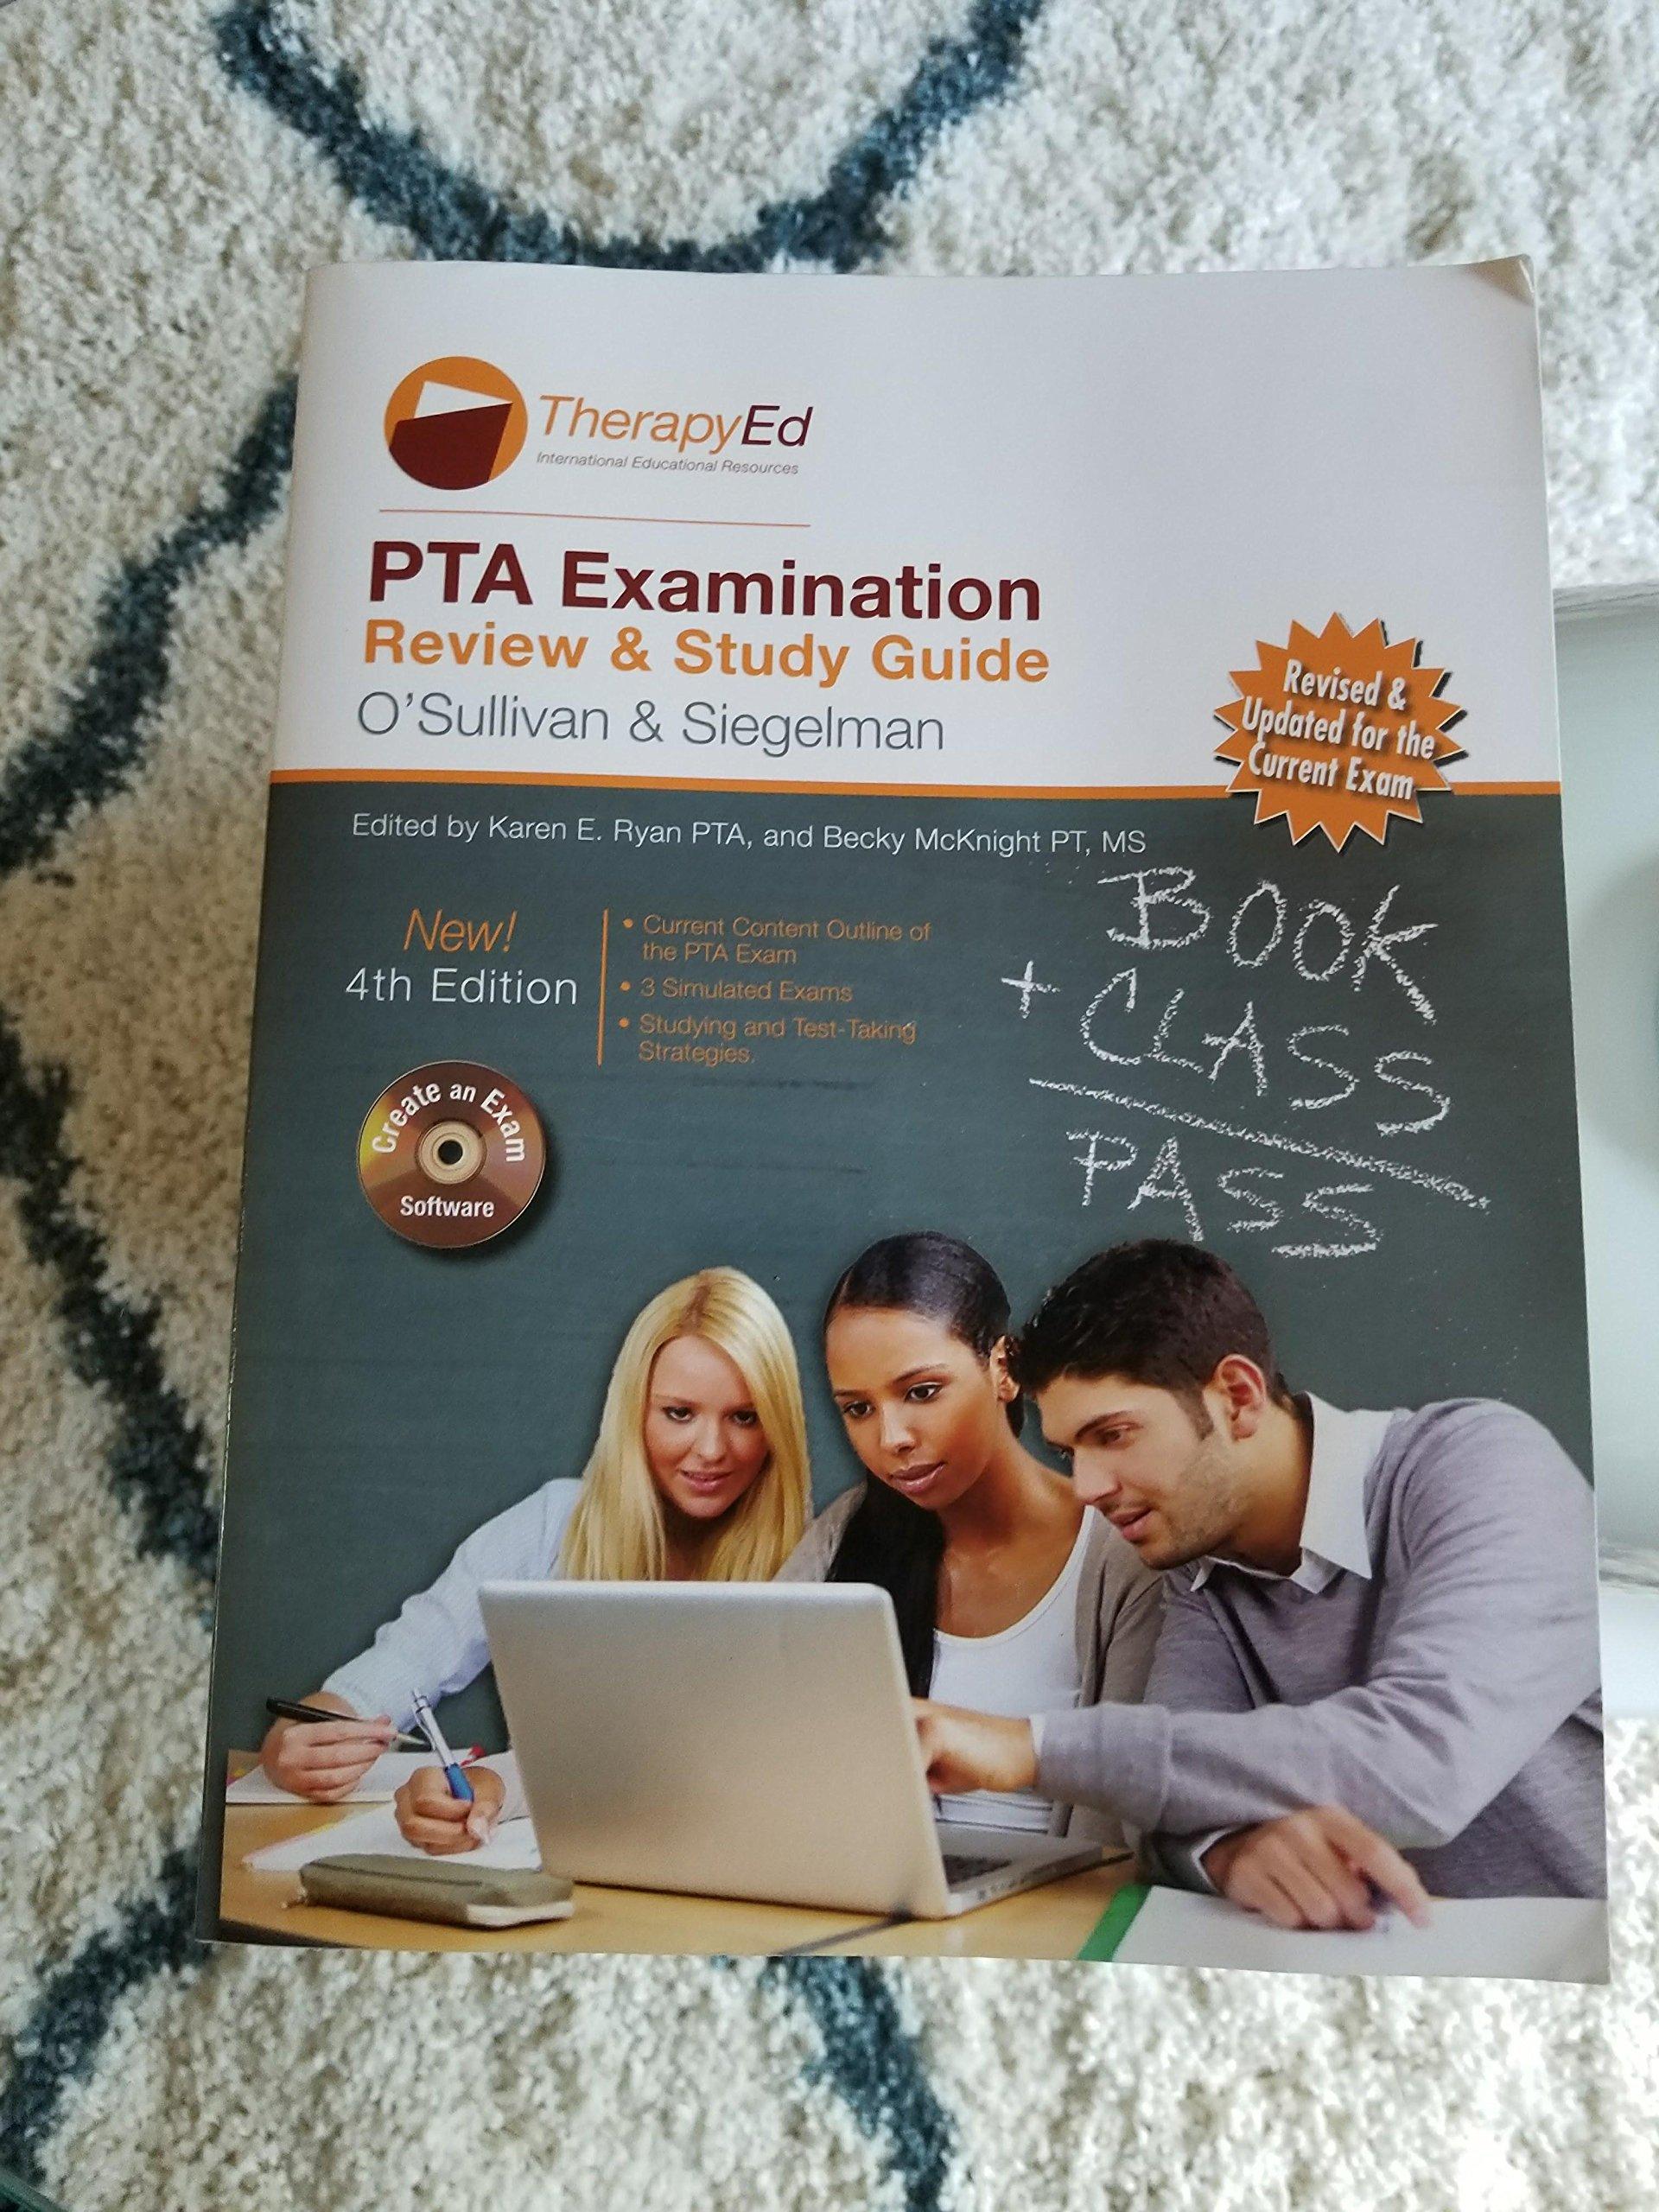 Pta Examination Review And Study Guide 4th Edition O Sullivan Siegelman 9780984339372 Amazon Com Books